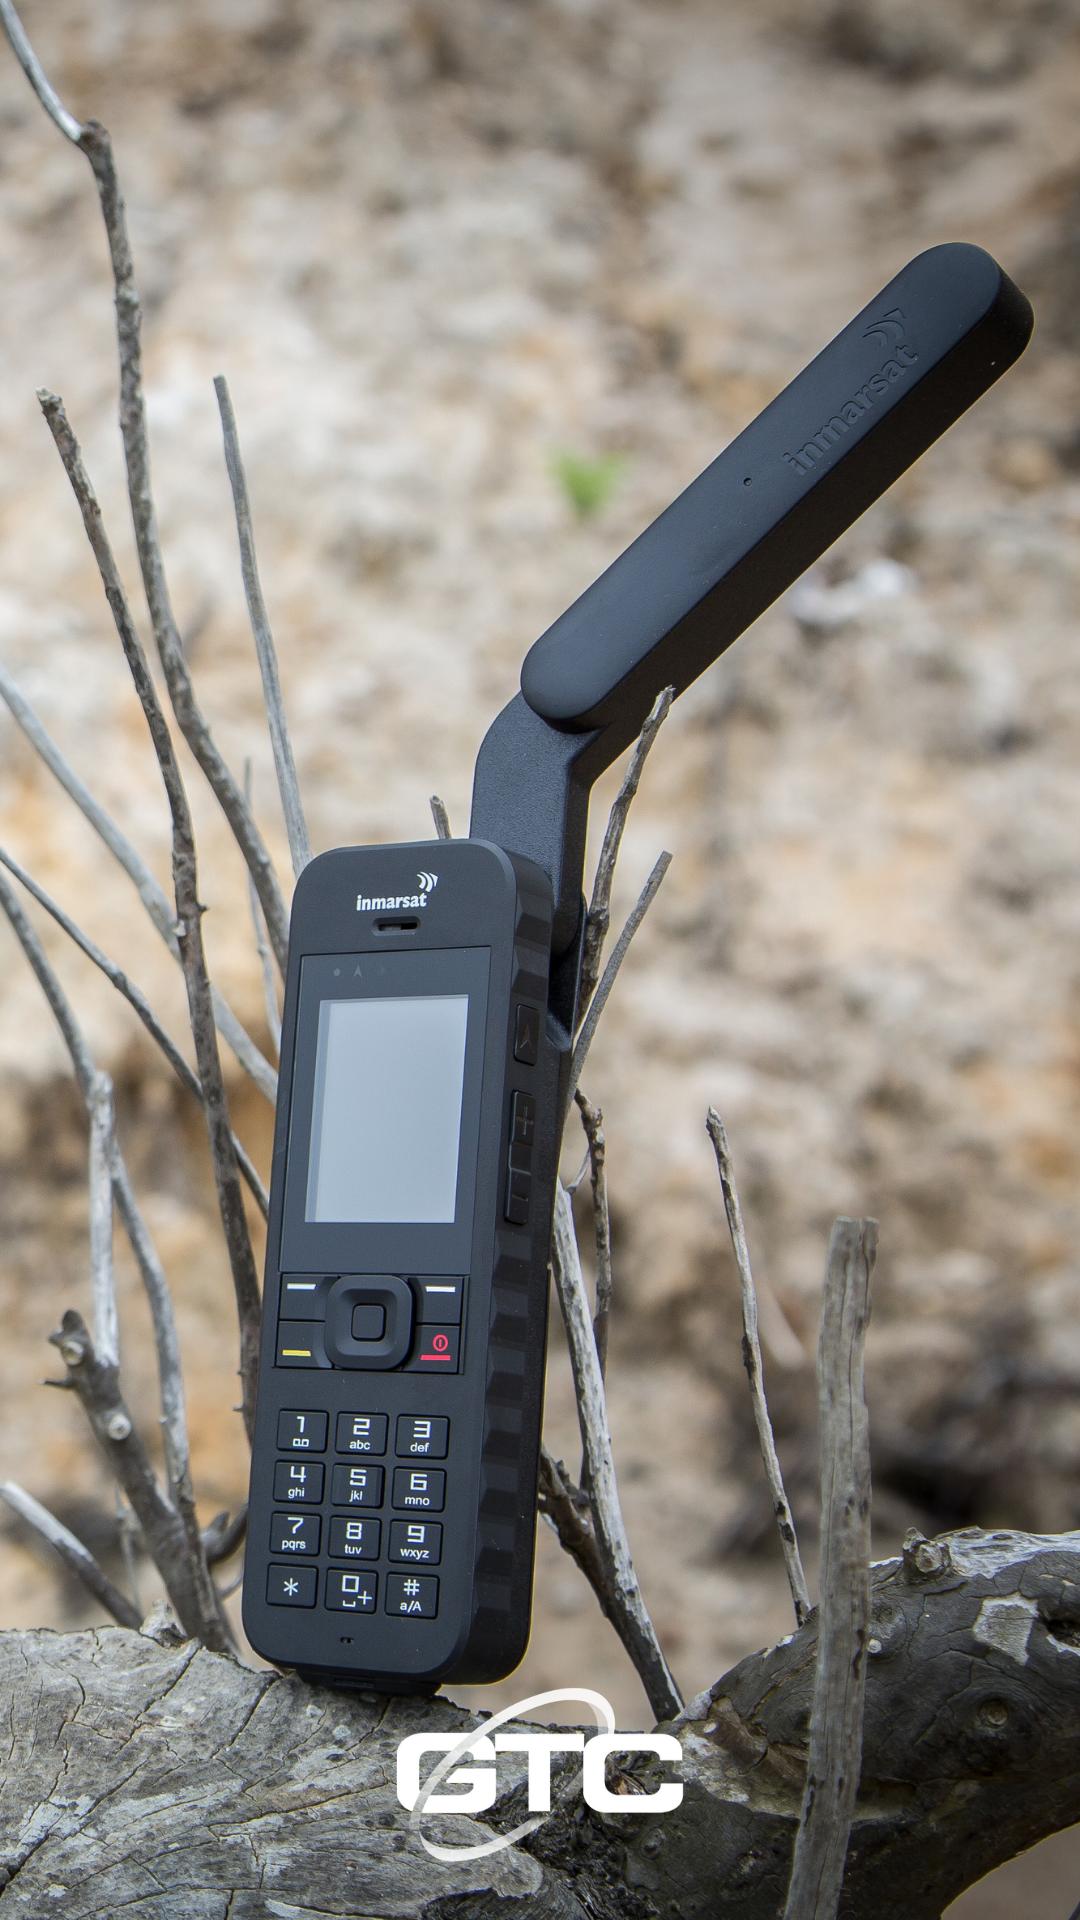 Inmarsat IsatPhone 2 Satellite Phone Handset in 2020